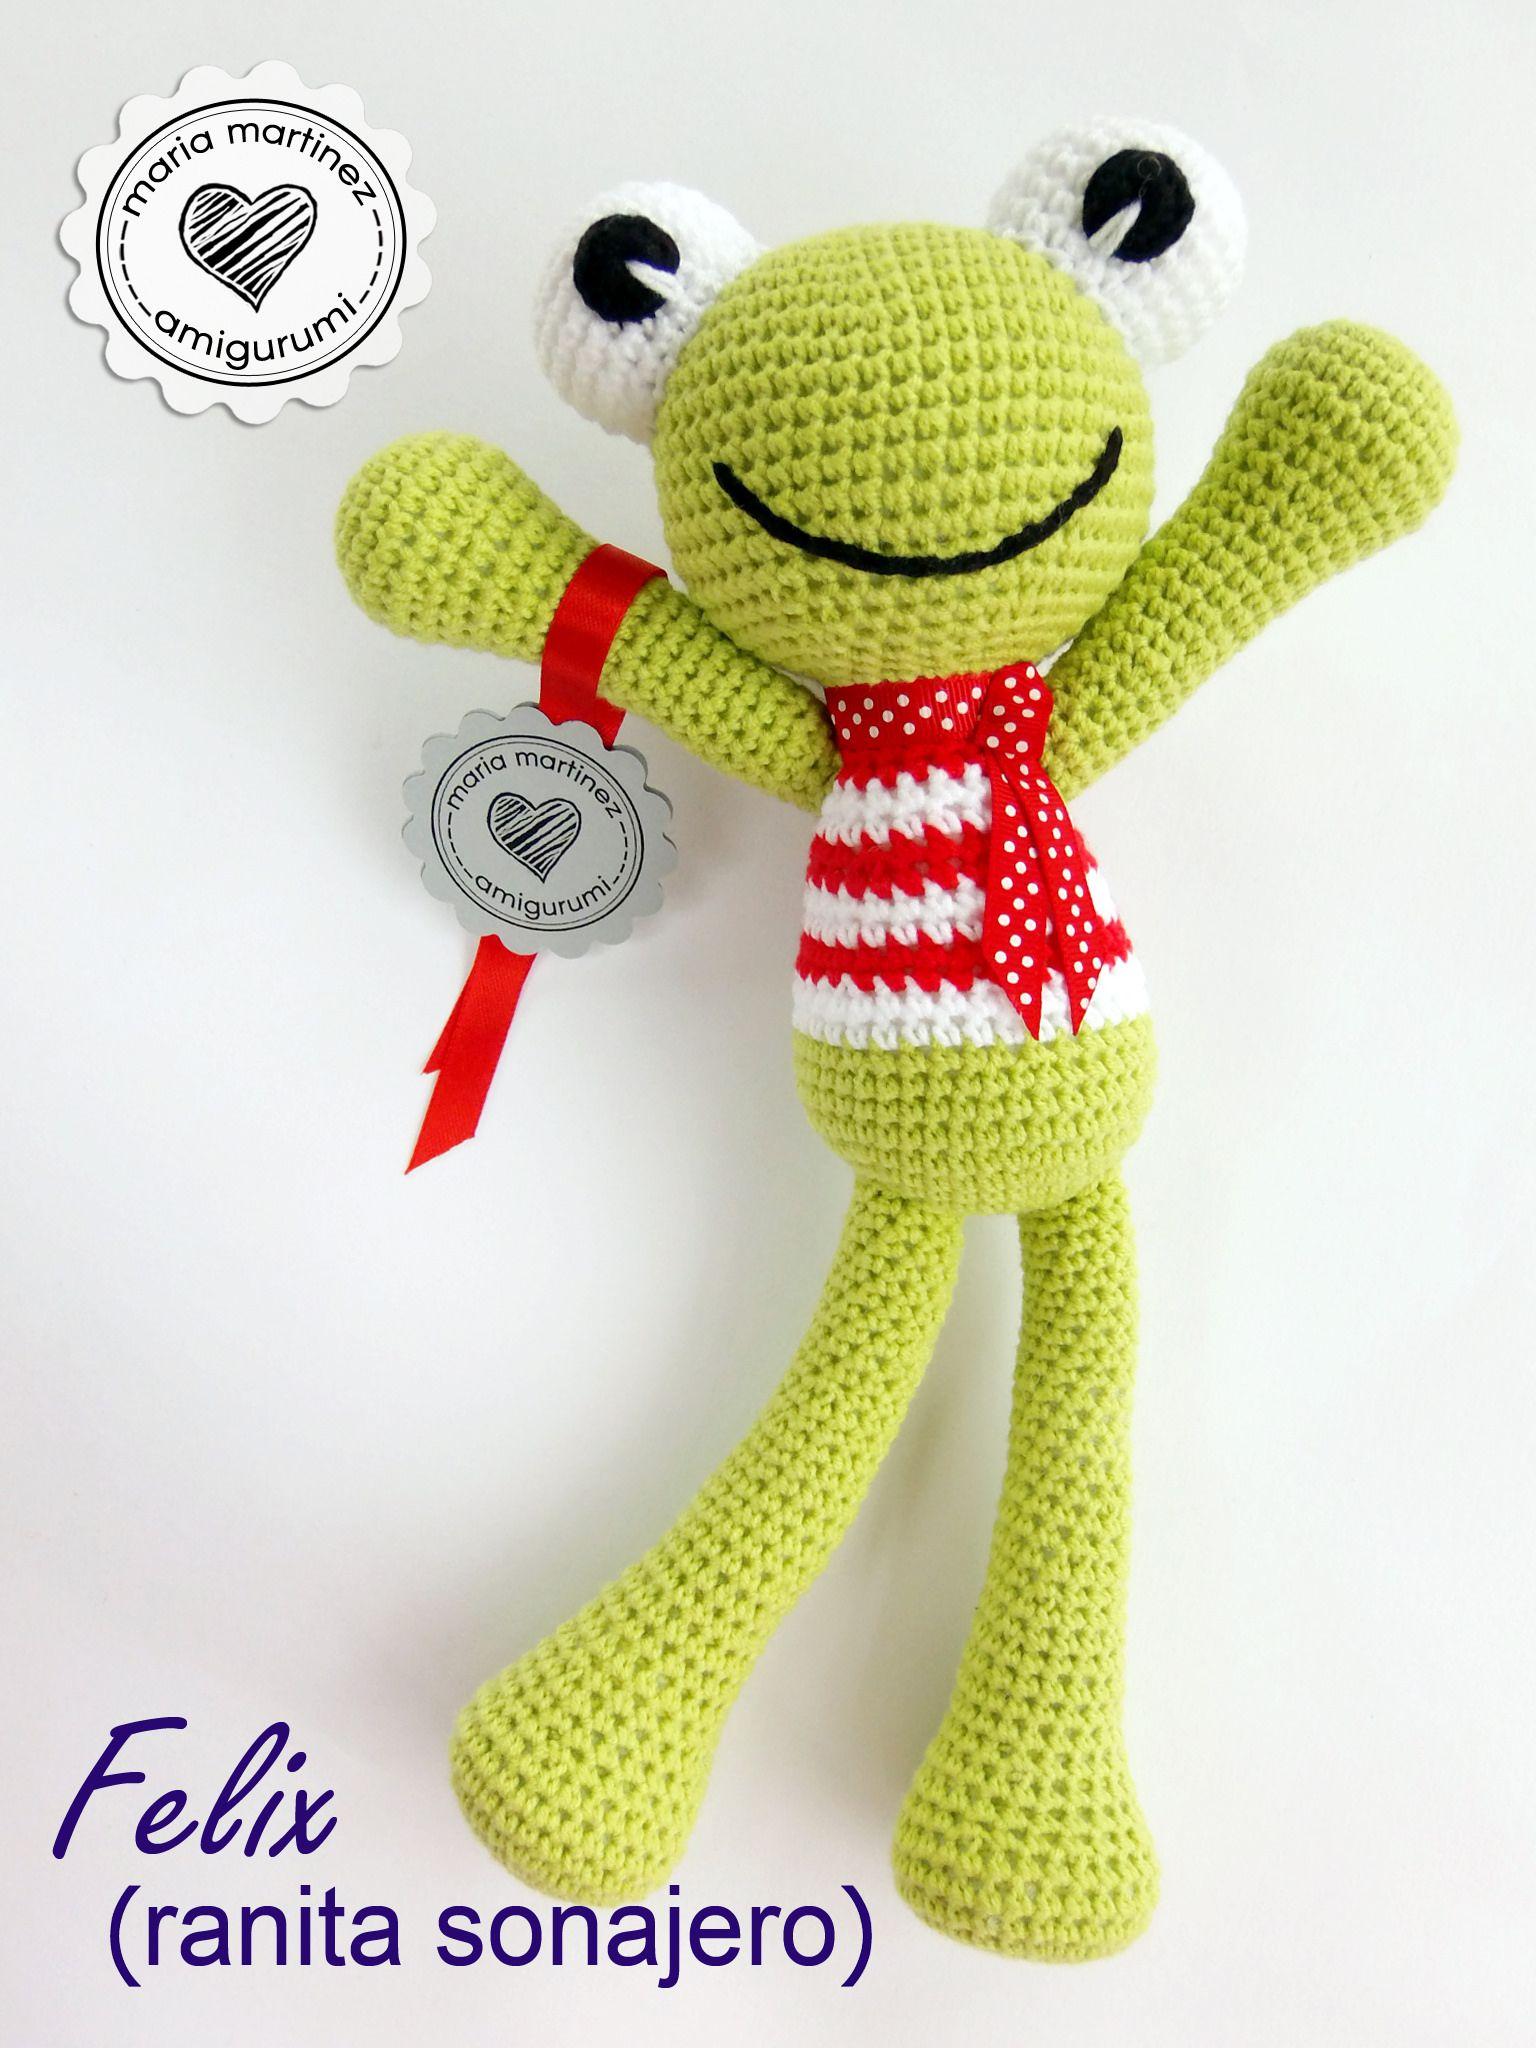 Maria Martinez Amigurumi: Rana Sonajero Crochet | Amigurumi ...